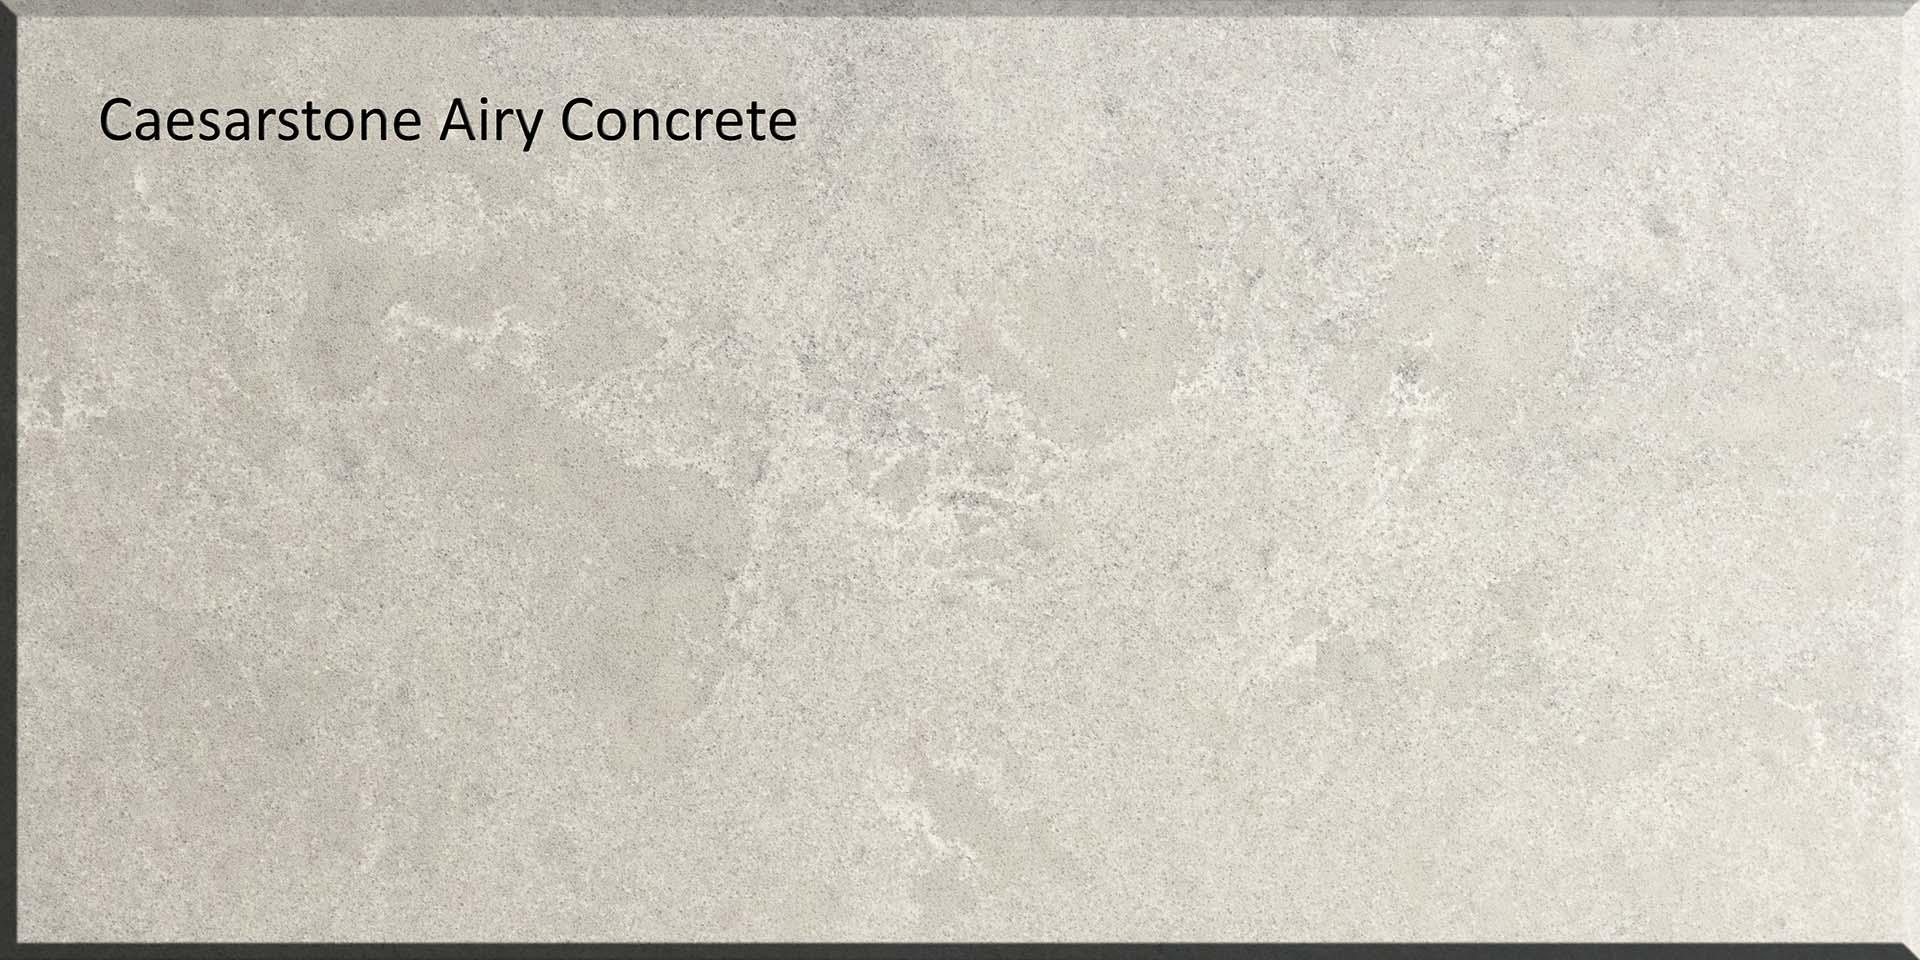 Caesarstone Quartz Worktops: three new materials with the